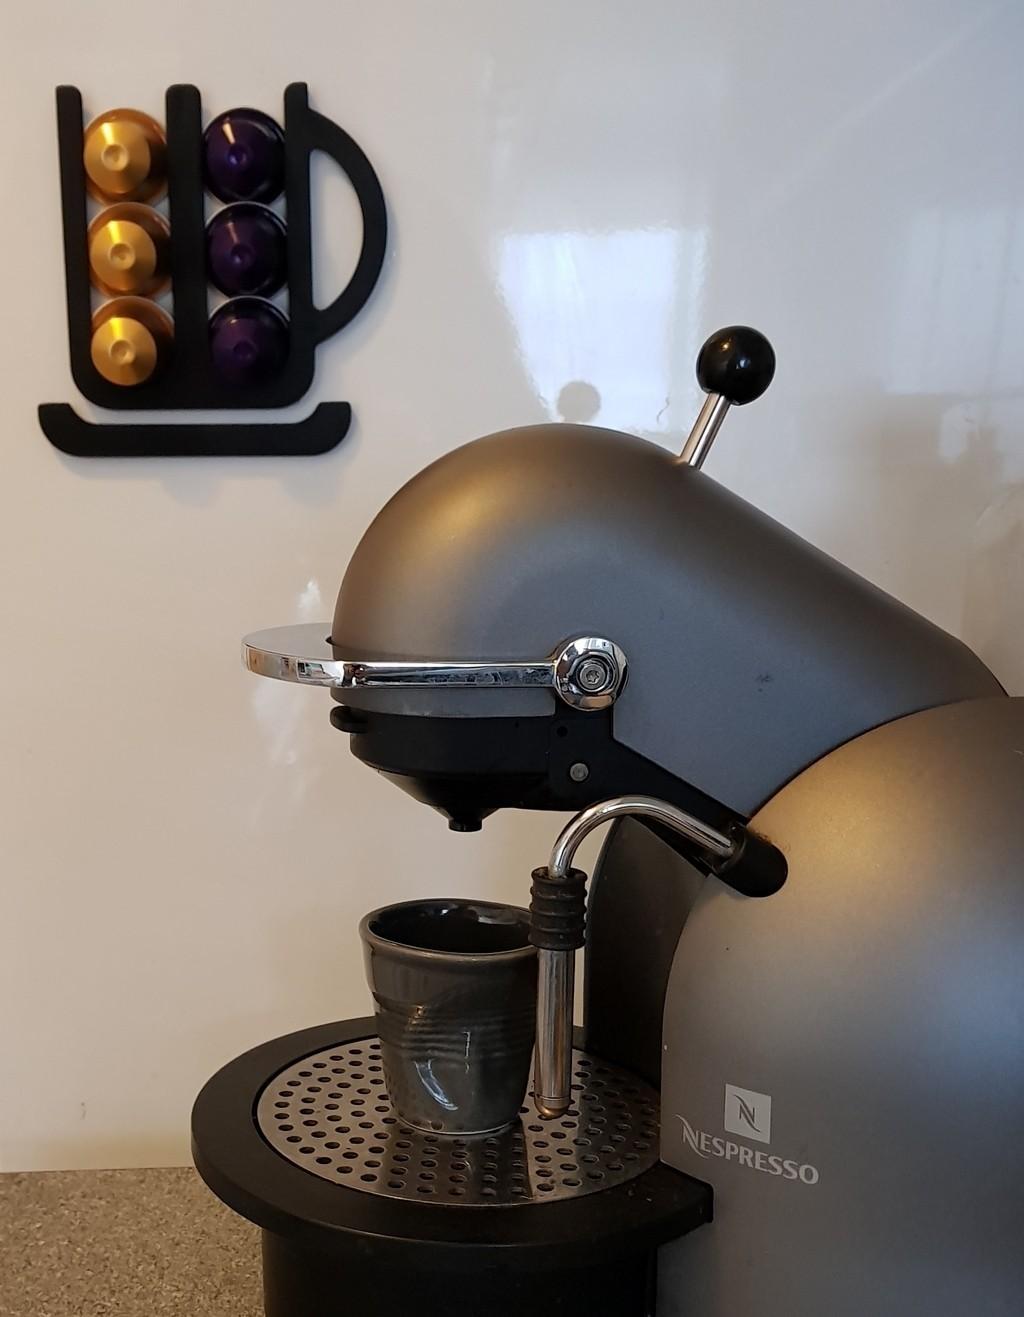 Nespresso Capsule Holder 01.jpg Download free STL file Nespresso Capsule Holder • Design to 3D print, phobosmoon